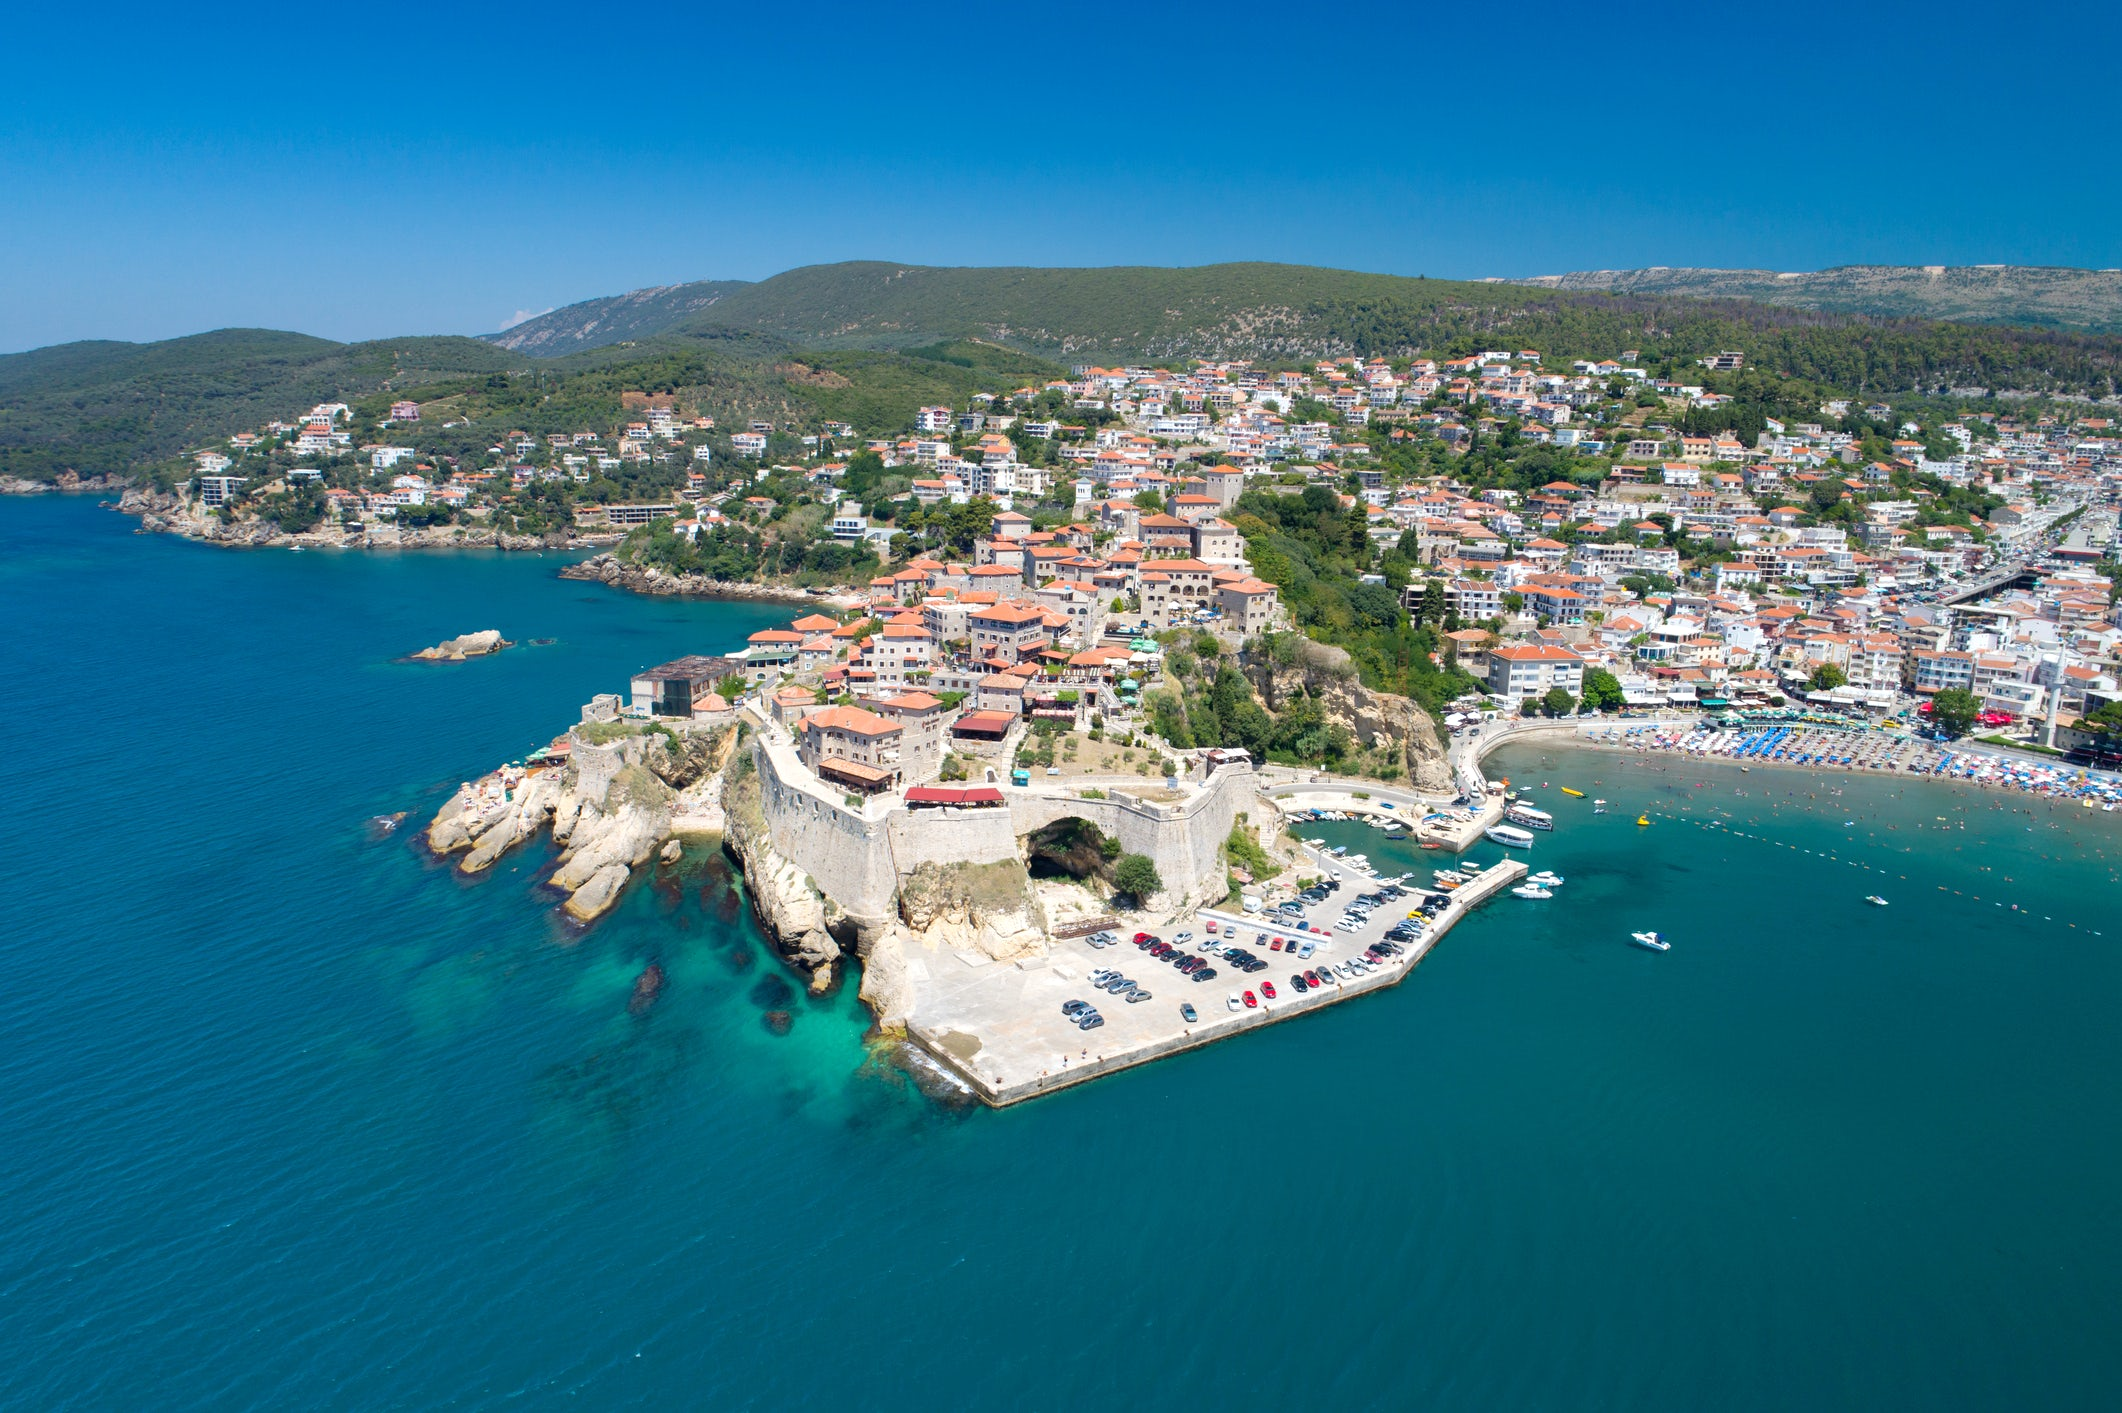 Ulcinj - the oldest town in Montenegro